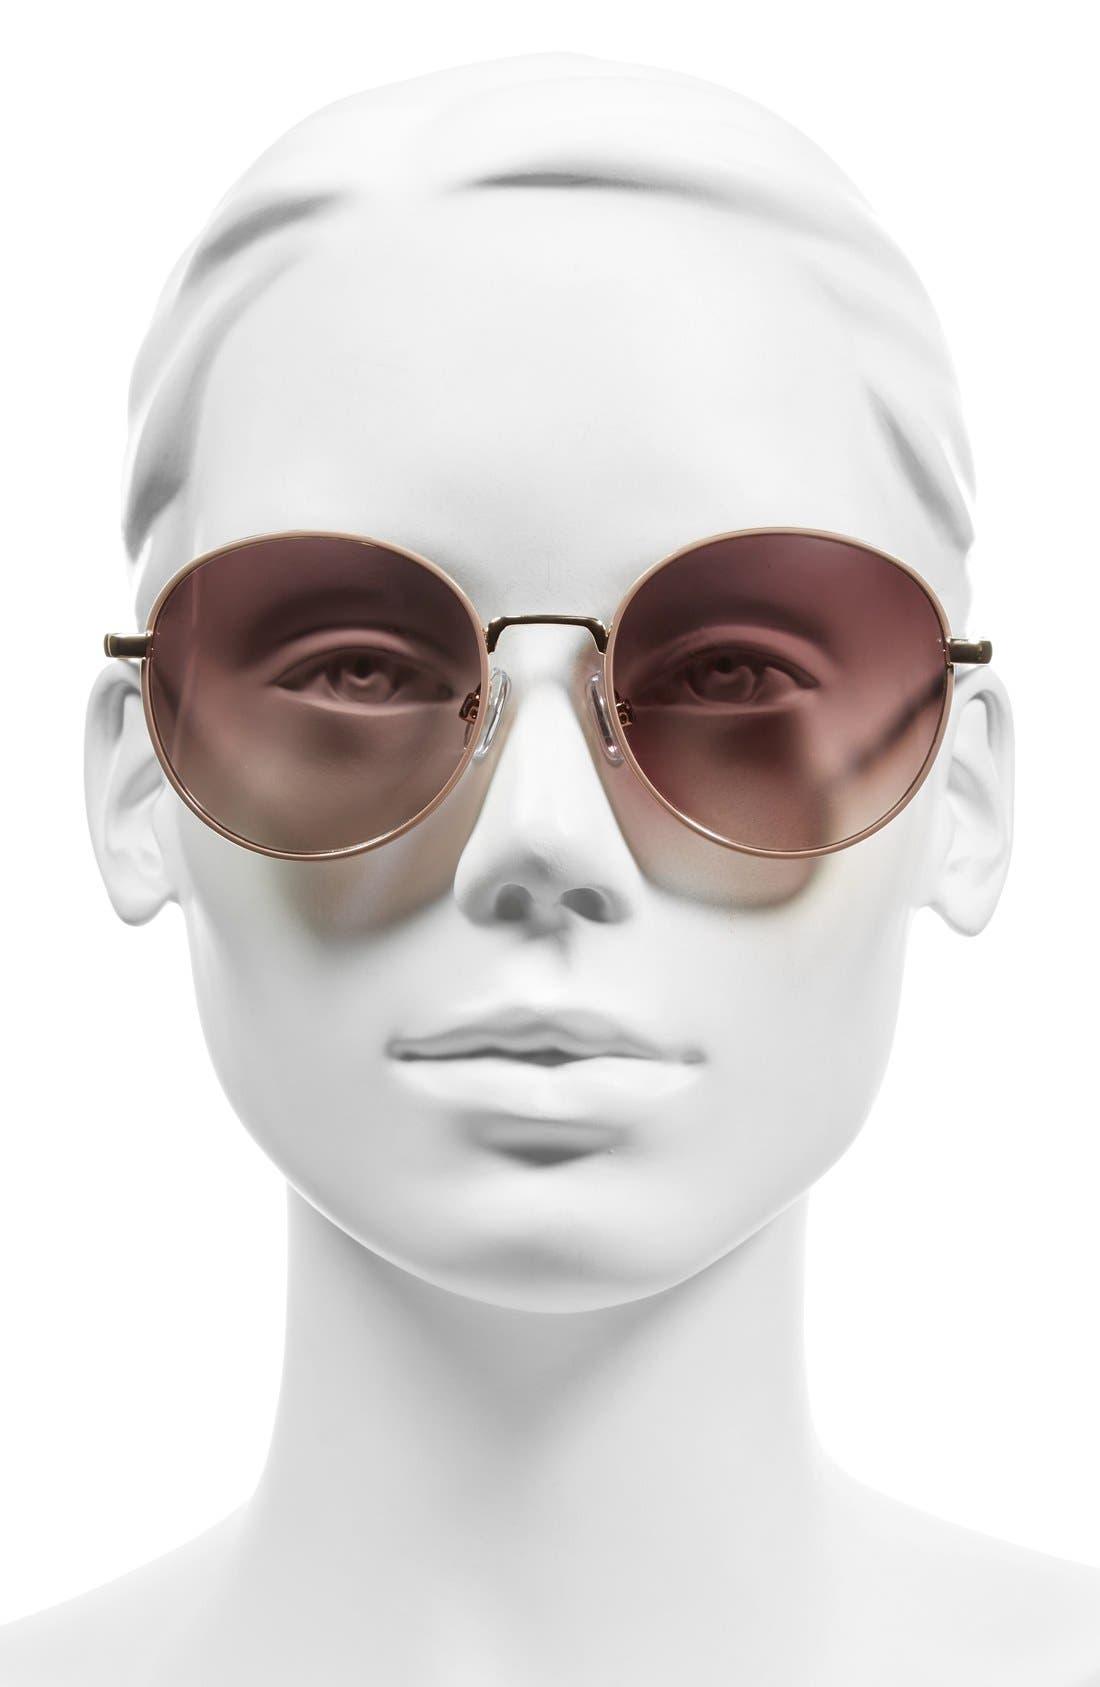 55mm Round Sunglasses,                             Alternate thumbnail 2, color,                             Mauve